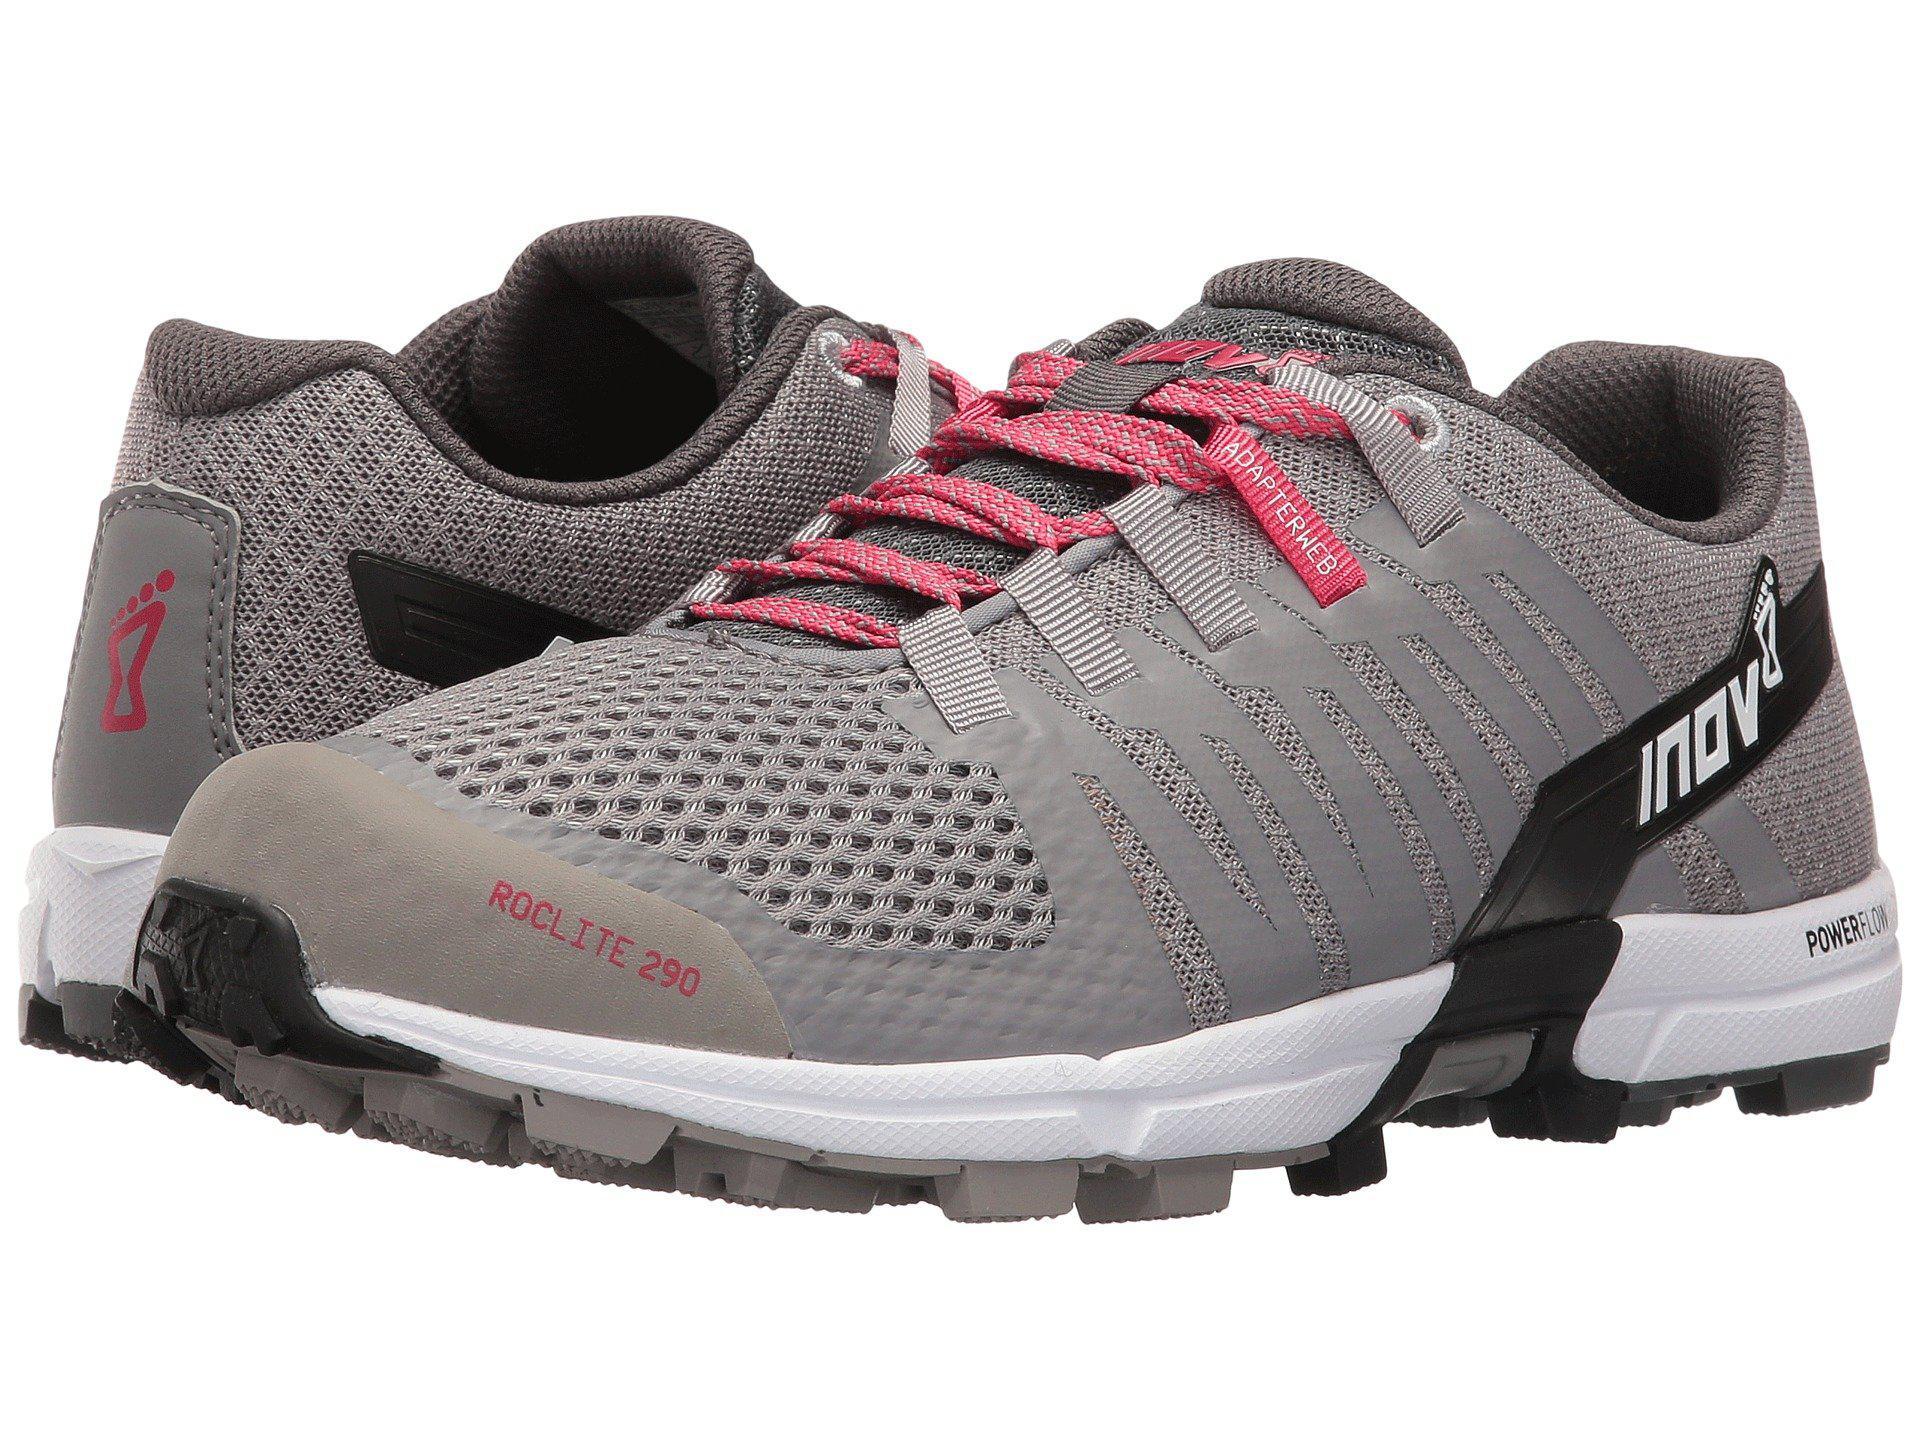 Lyst - Inov-8 Roclite 290 (blue Grey white) Women s Shoes in Gray 7f2664a6e9a